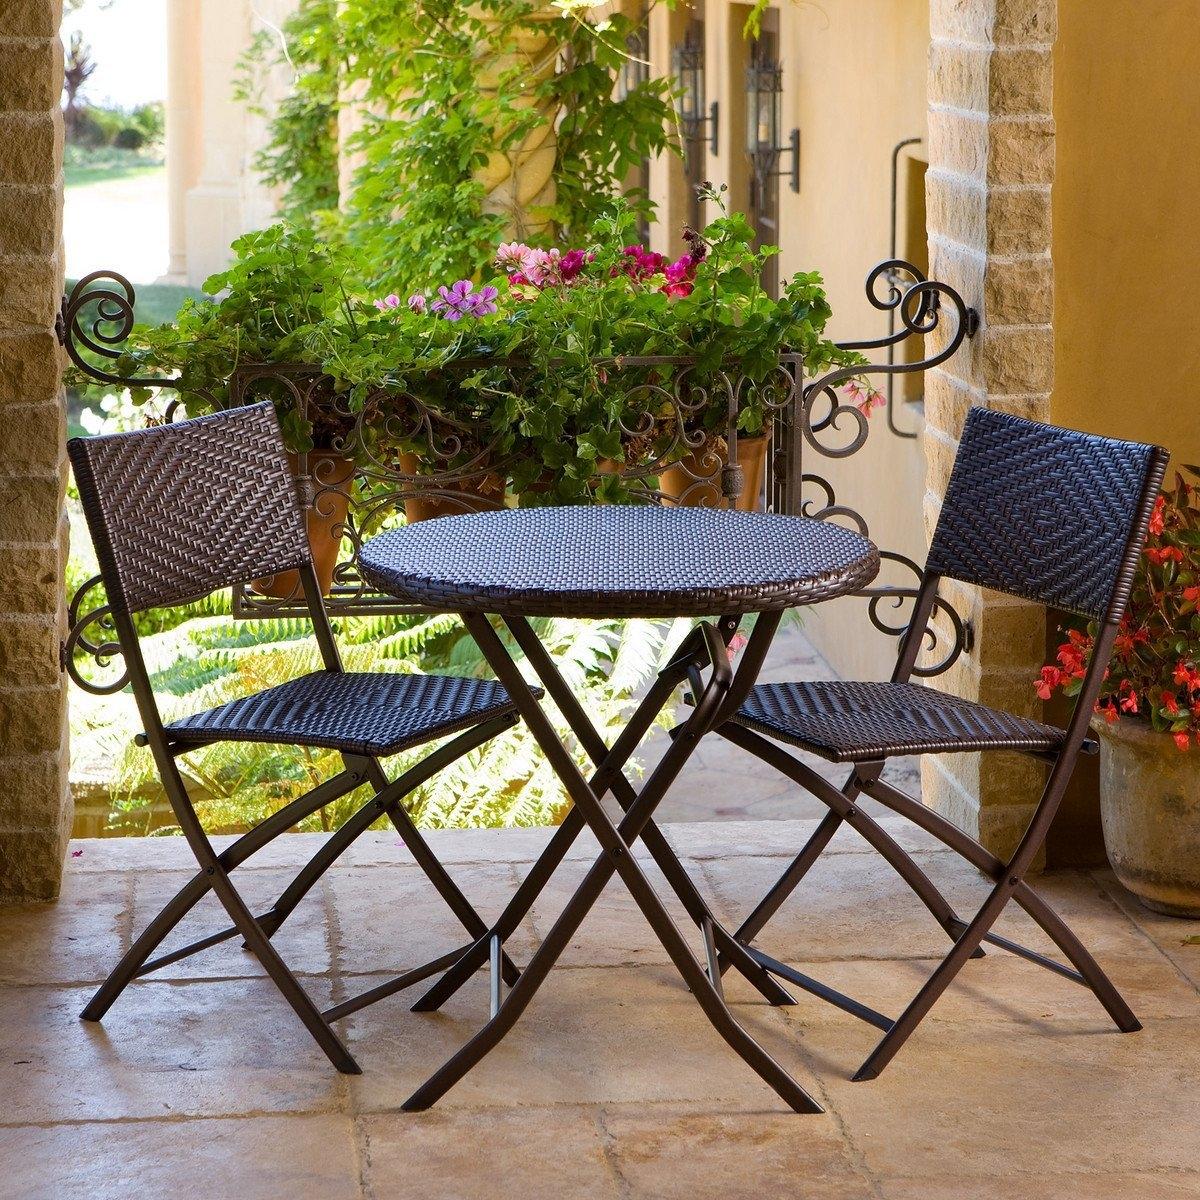 3 piece outdoor bistro patio furniture set in espresso